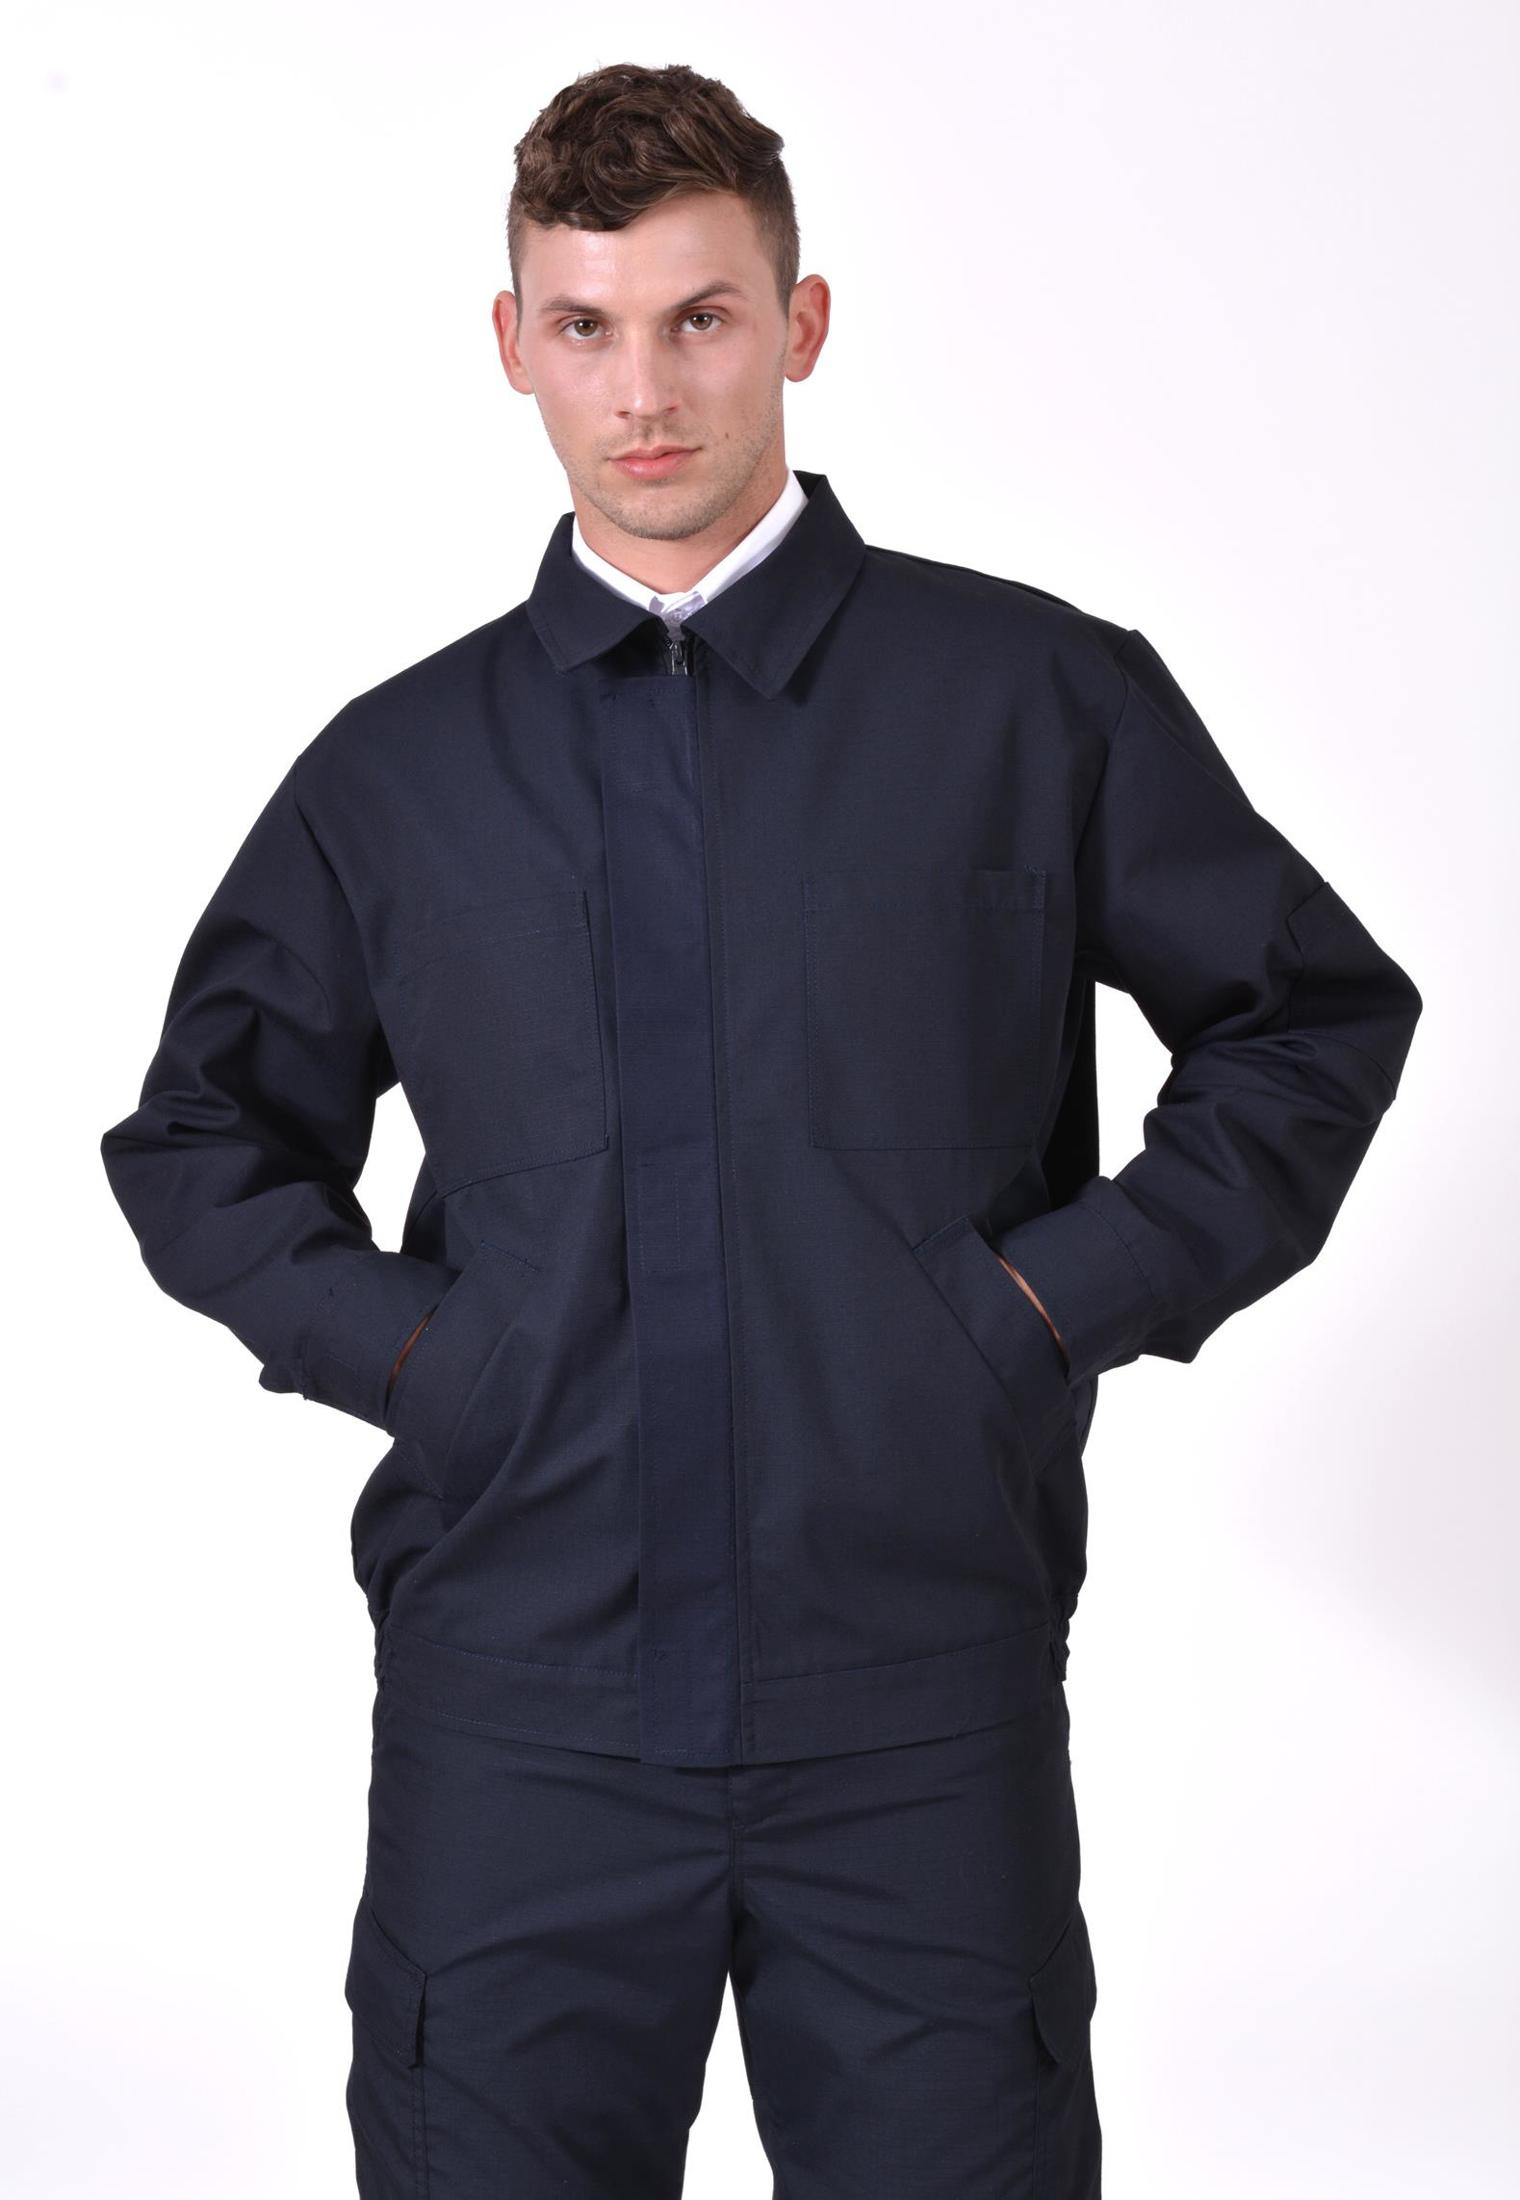 muška vatrogasna twill hardshell jakna s reflektirajućim paspulima, vodonepropusna, vjetronepropusna, men's firefighter jacket with reflective piping, twill hardshell